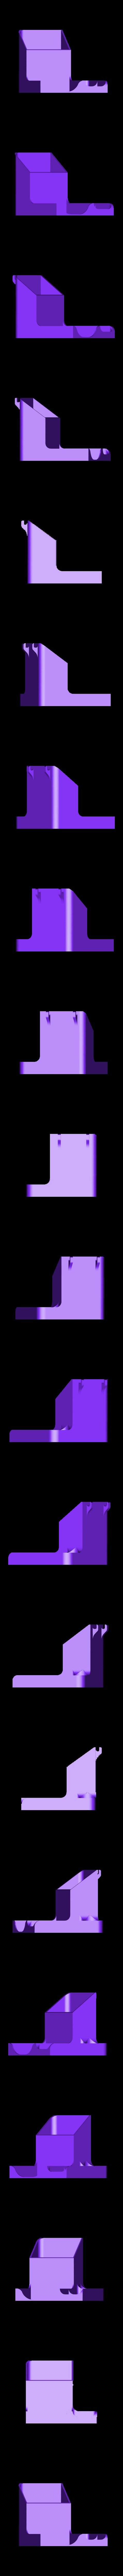 Office_Organizer.stl Download free STL file Desk Organizer • 3D printable design, derailed